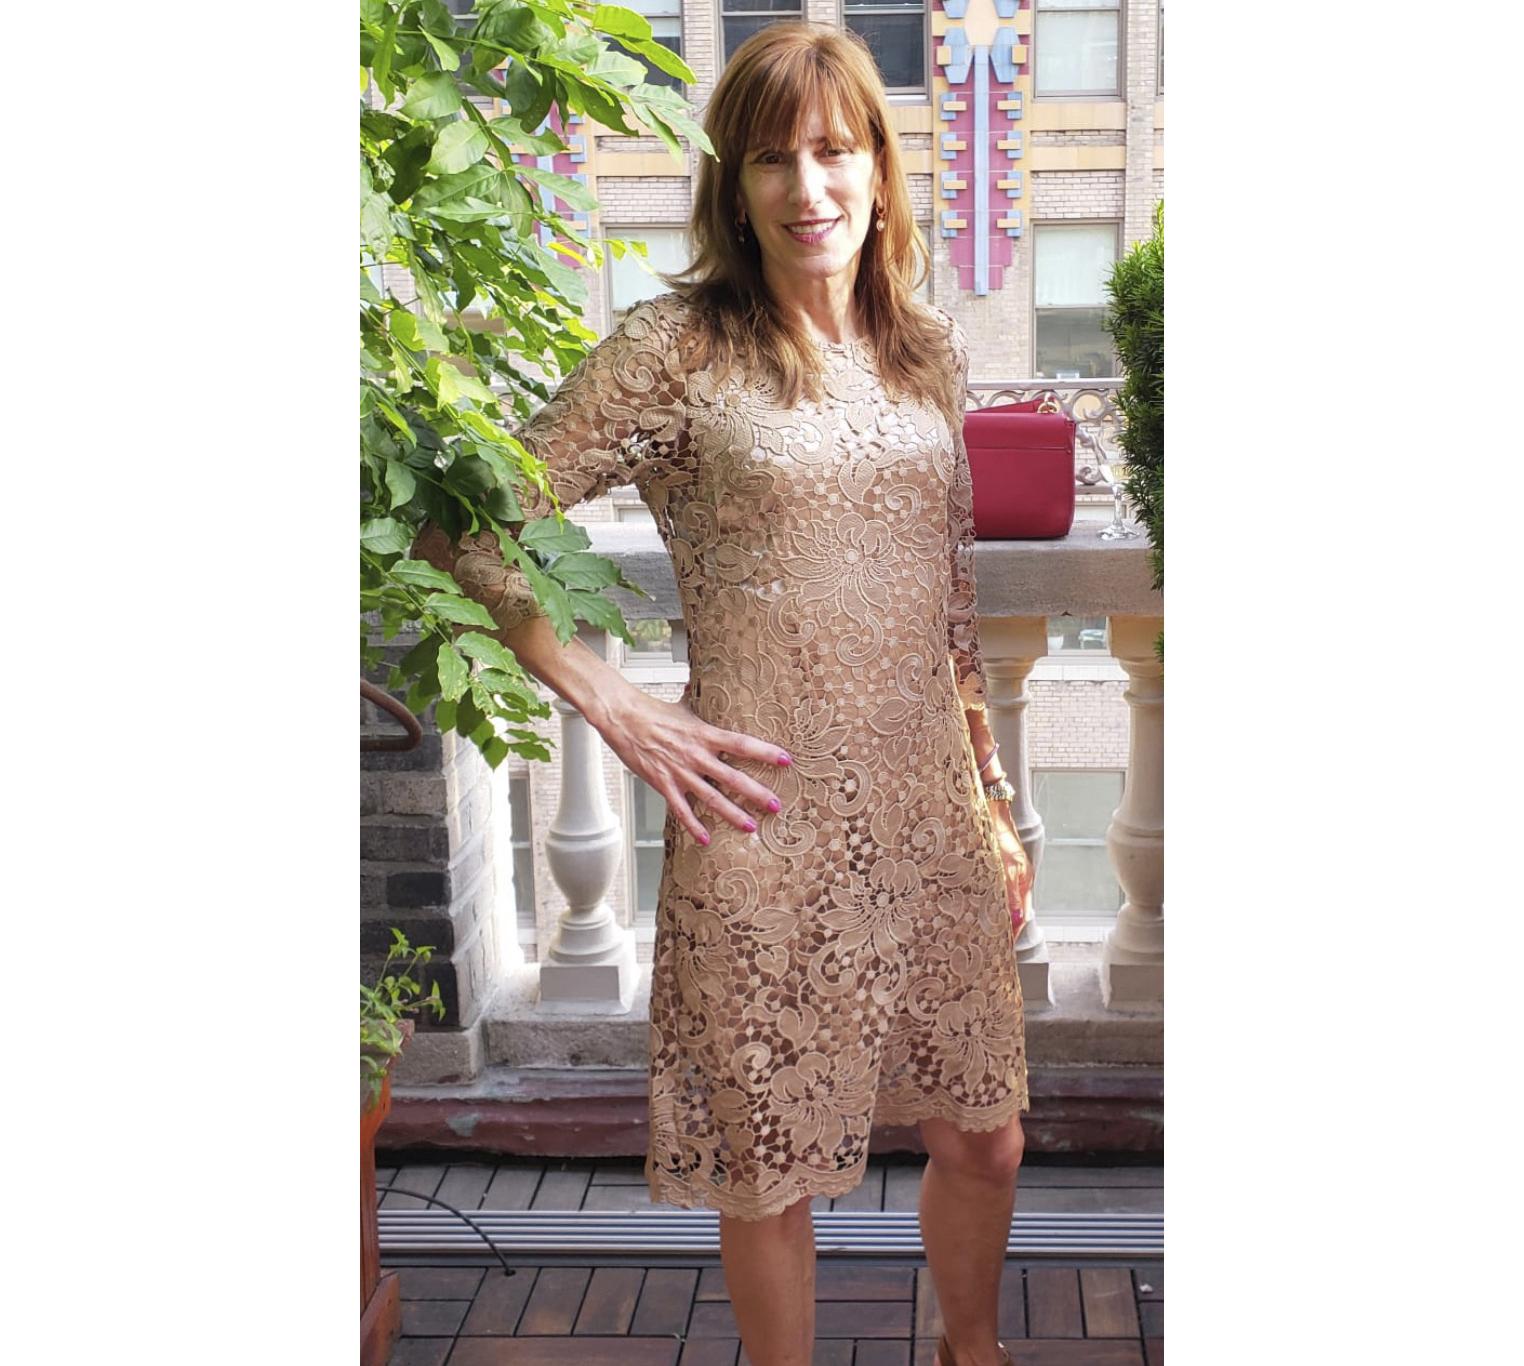 Linda March